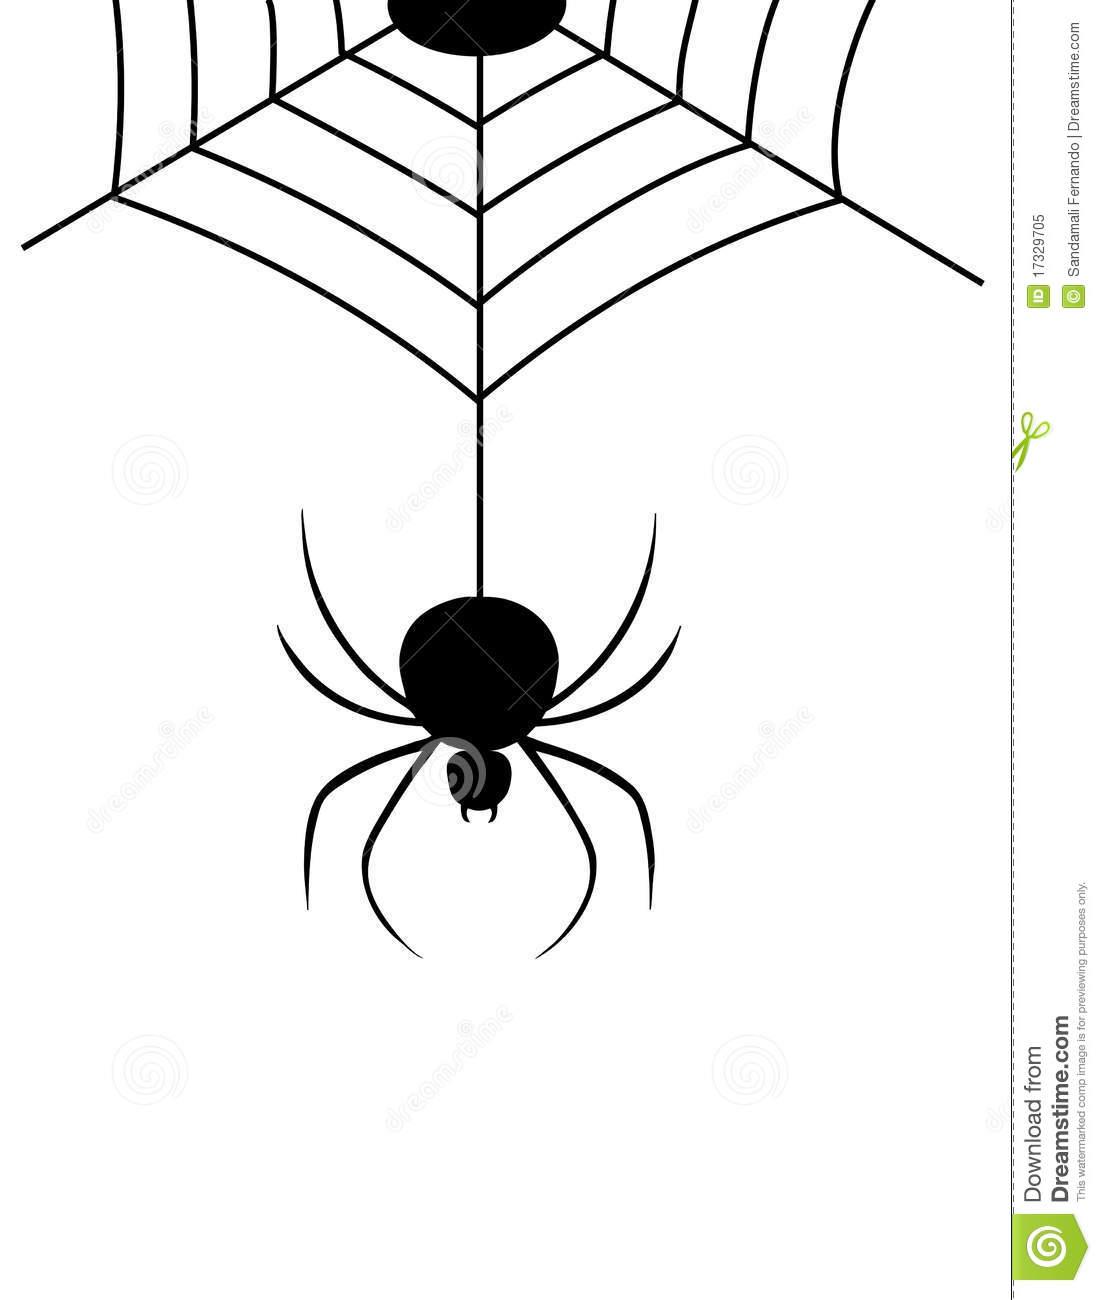 Corner Spider Web Clipart | Clipart Panda - Free Clipart ...